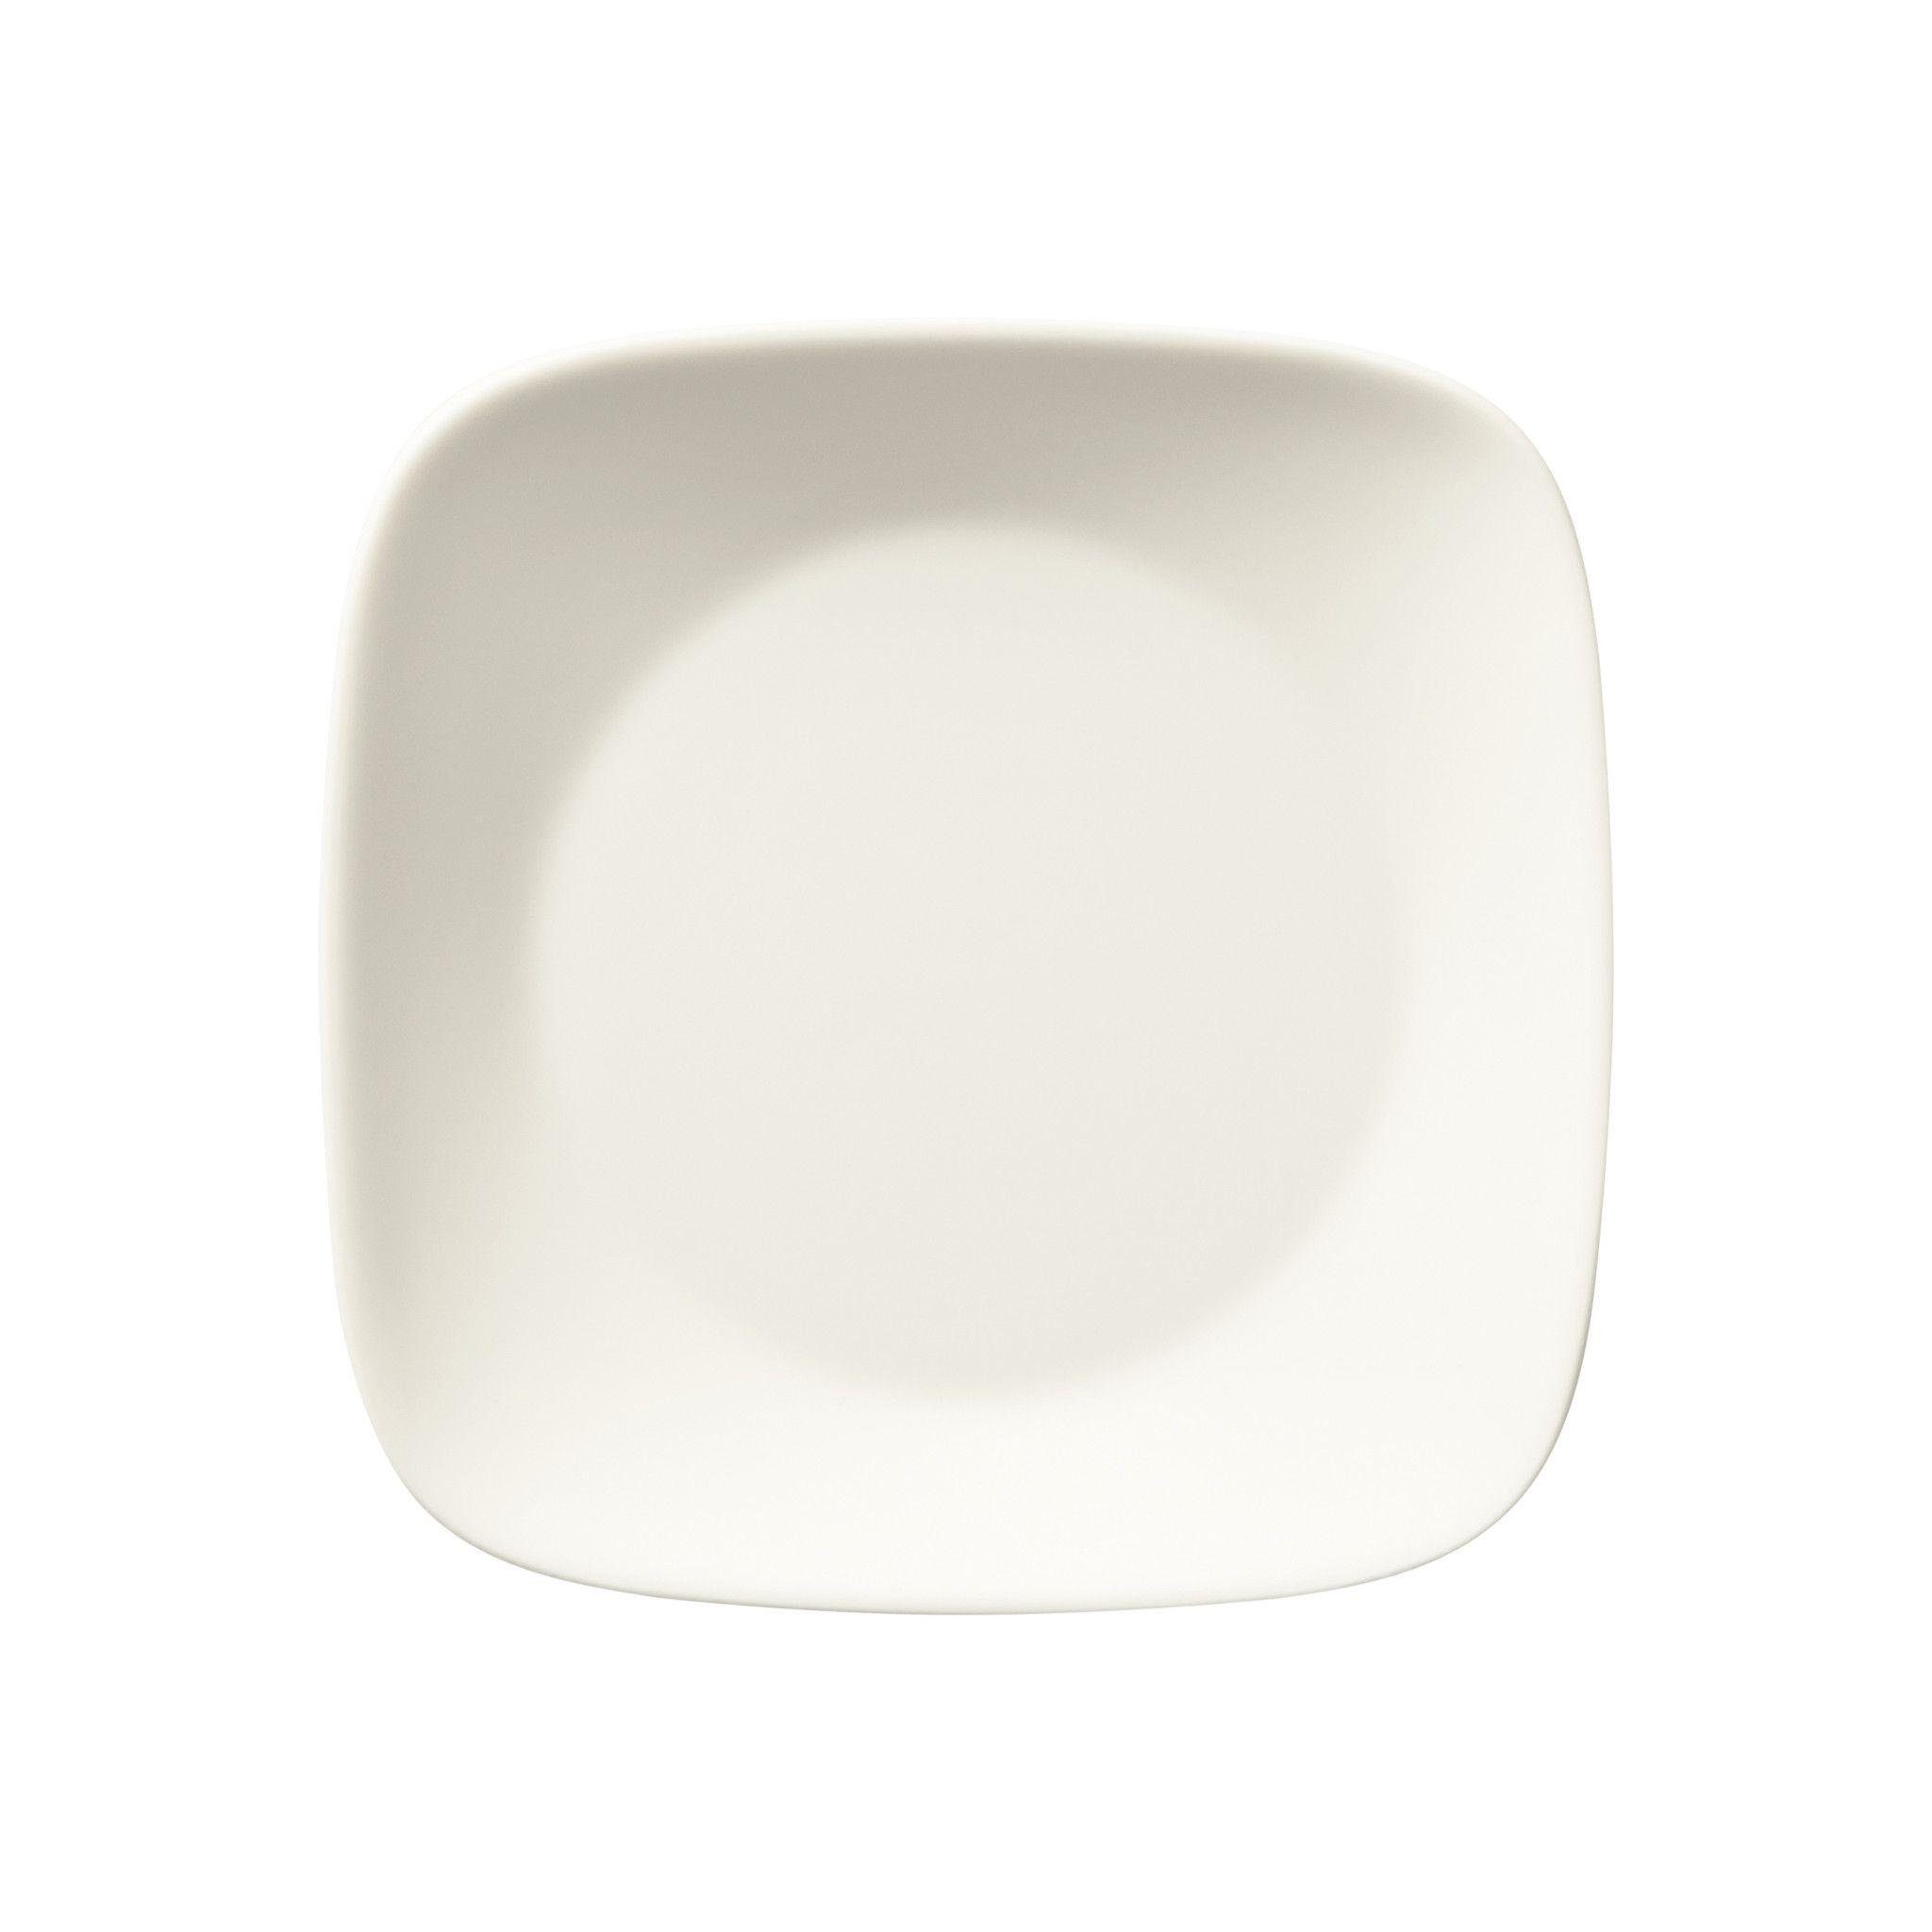 Warm White 6 5 Quot Square Plate Corningware